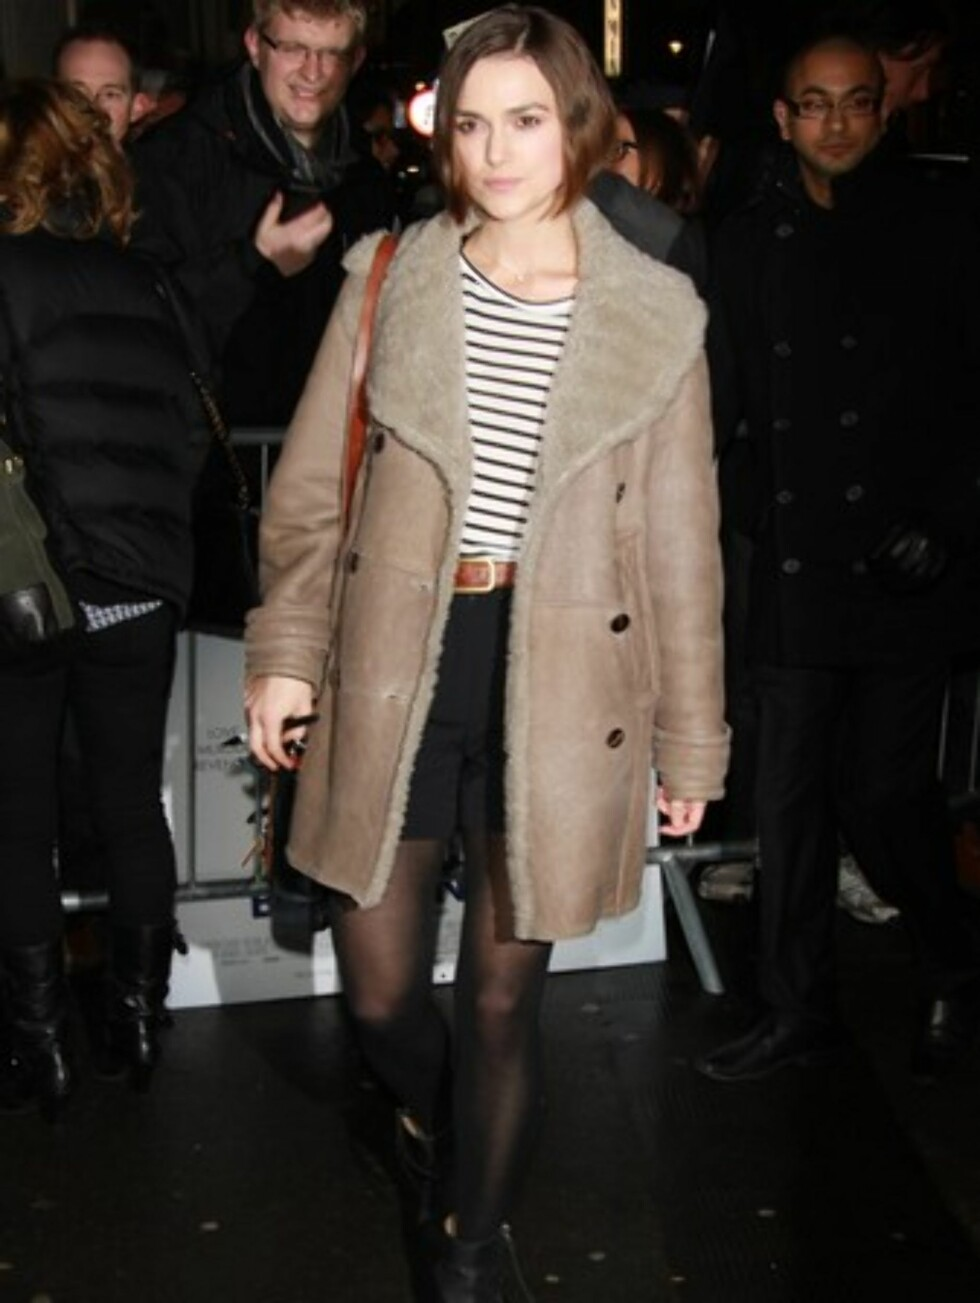 Skuespiller Keira Knightley. Foto: All Over Press